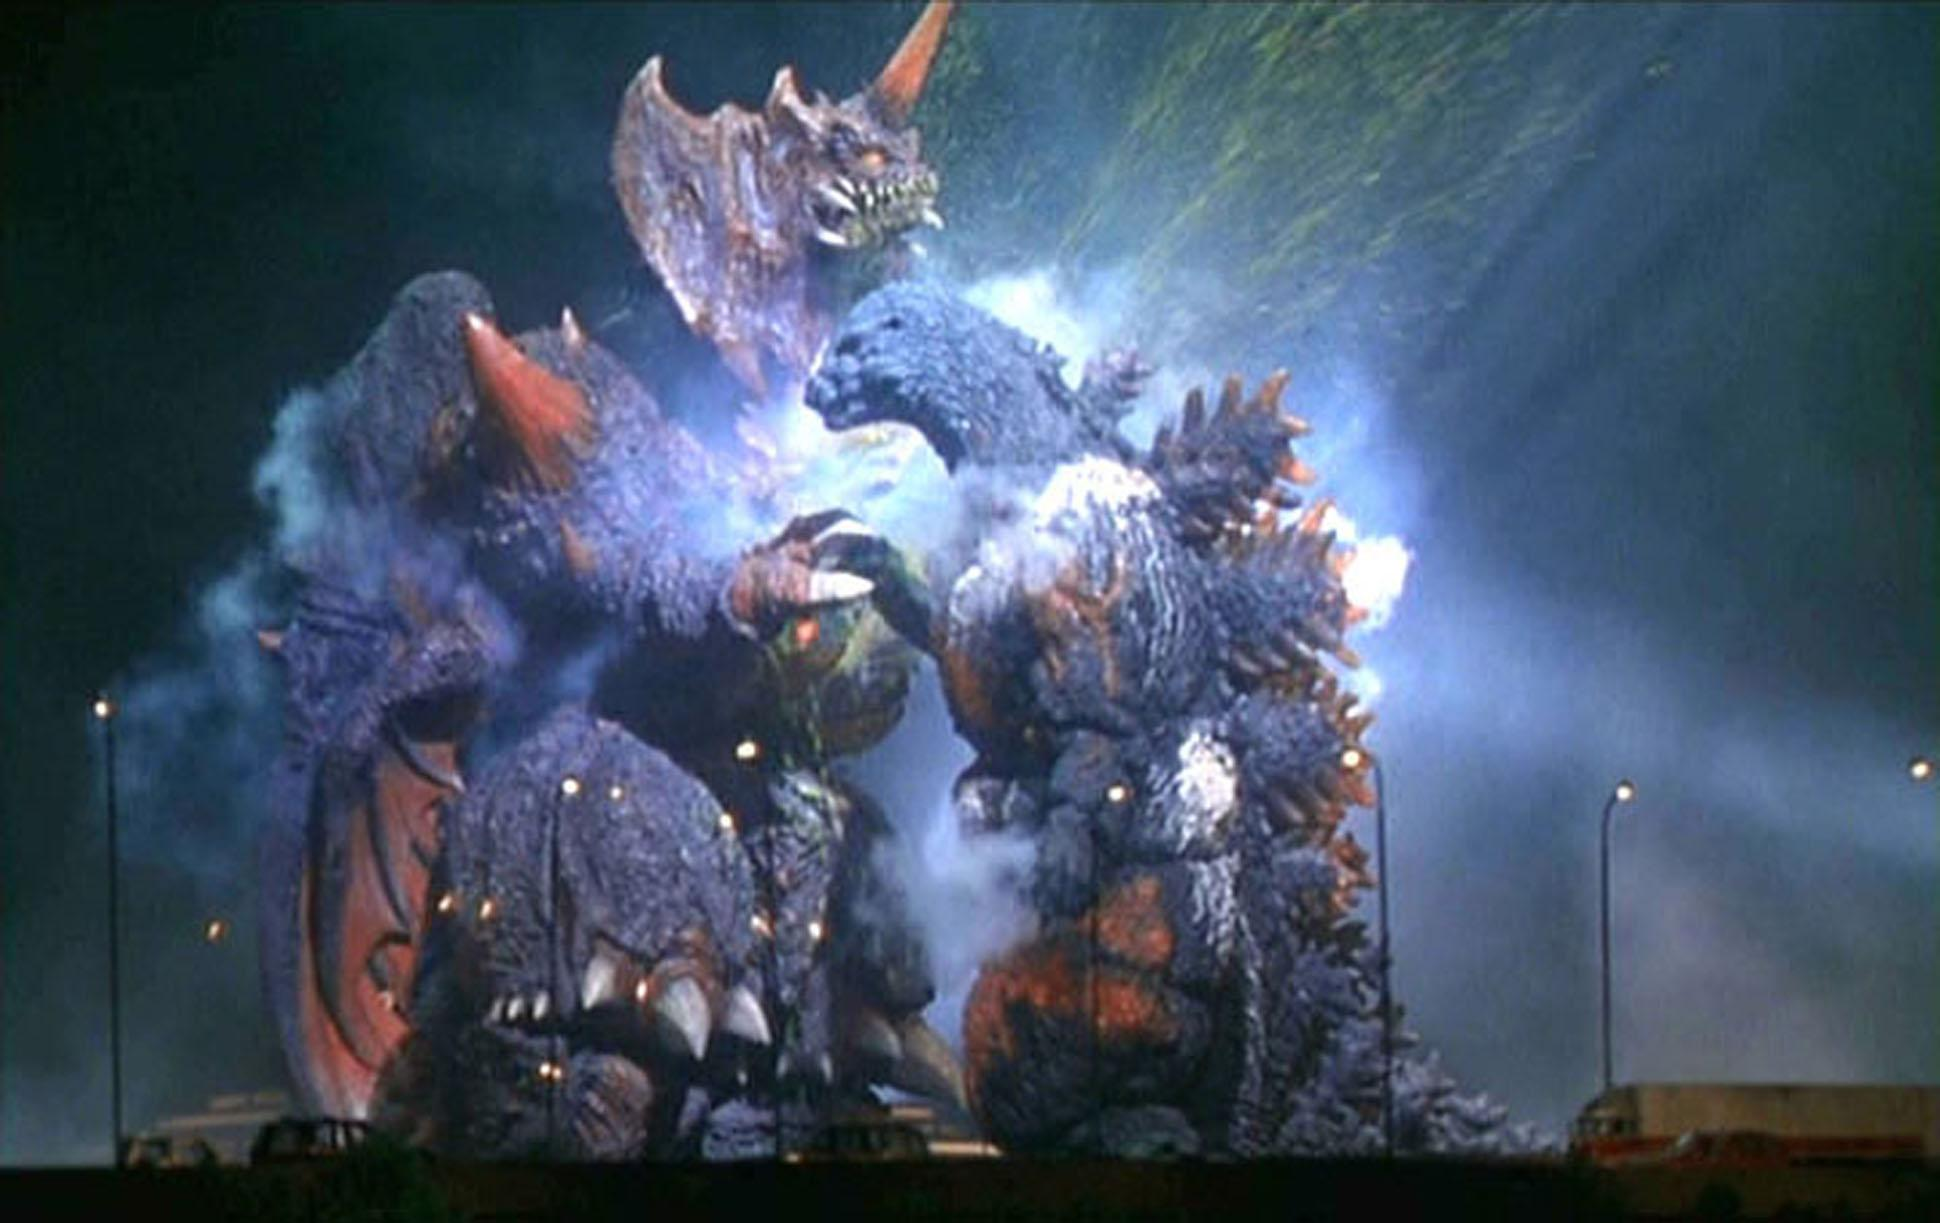 Godzilla Vs Destoroyah Wallpapers HD Download 1940x1223